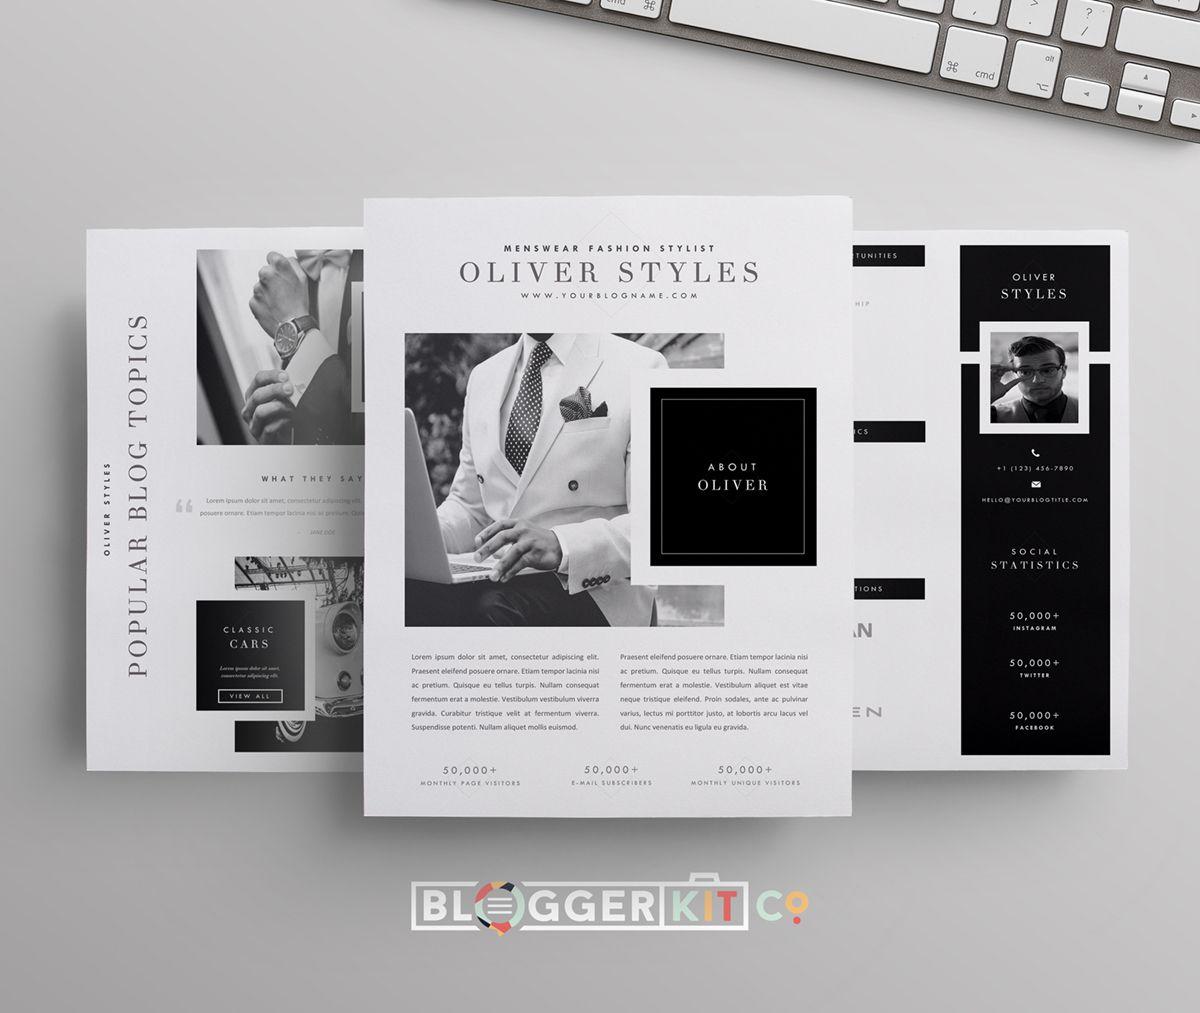 Dapper Blogger Media Kit Template Media Kit Template Press Kit